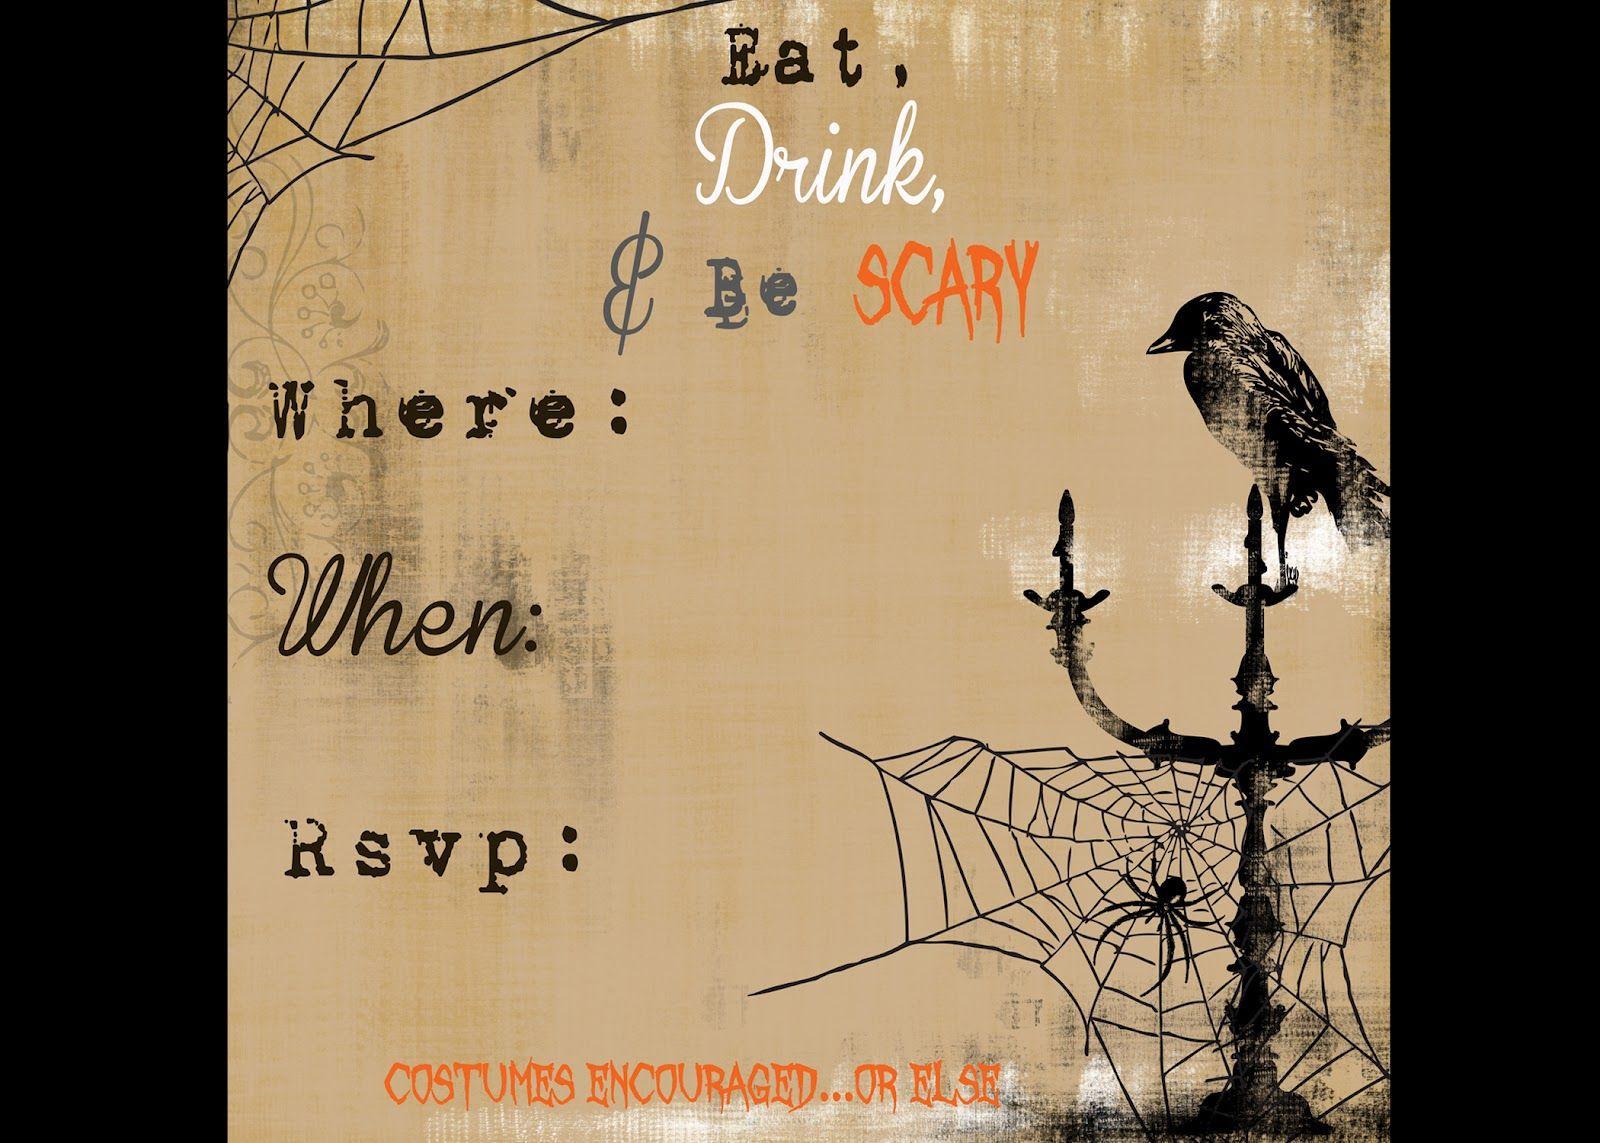 006 Surprising Free Halloween Invitation Template Inspiration  Templates Microsoft Word Wedding Printable PartyFull